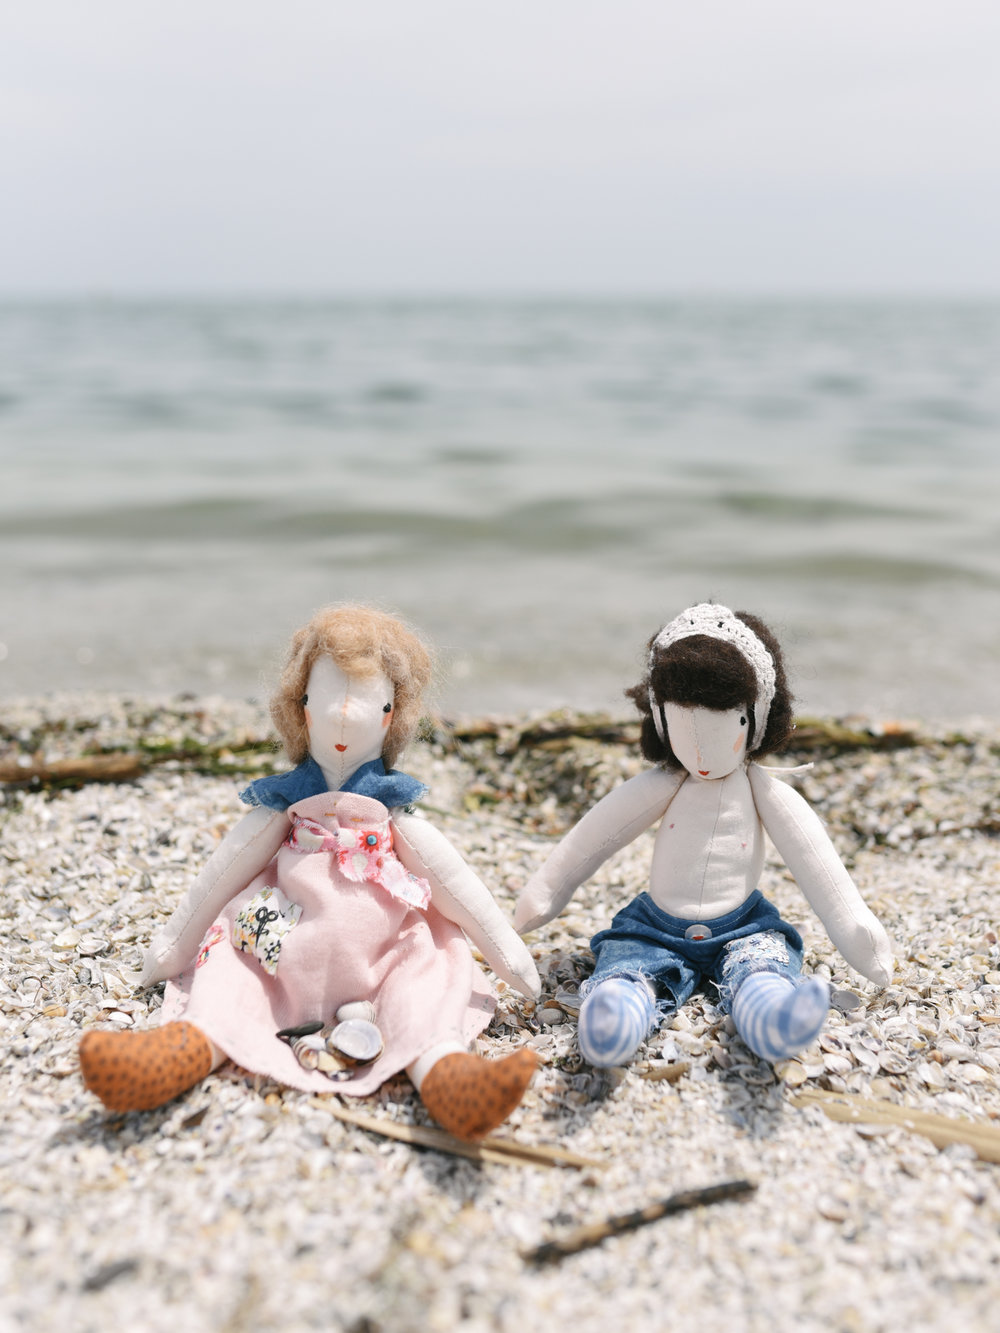 dolls at beach  (1 of 1).jpg